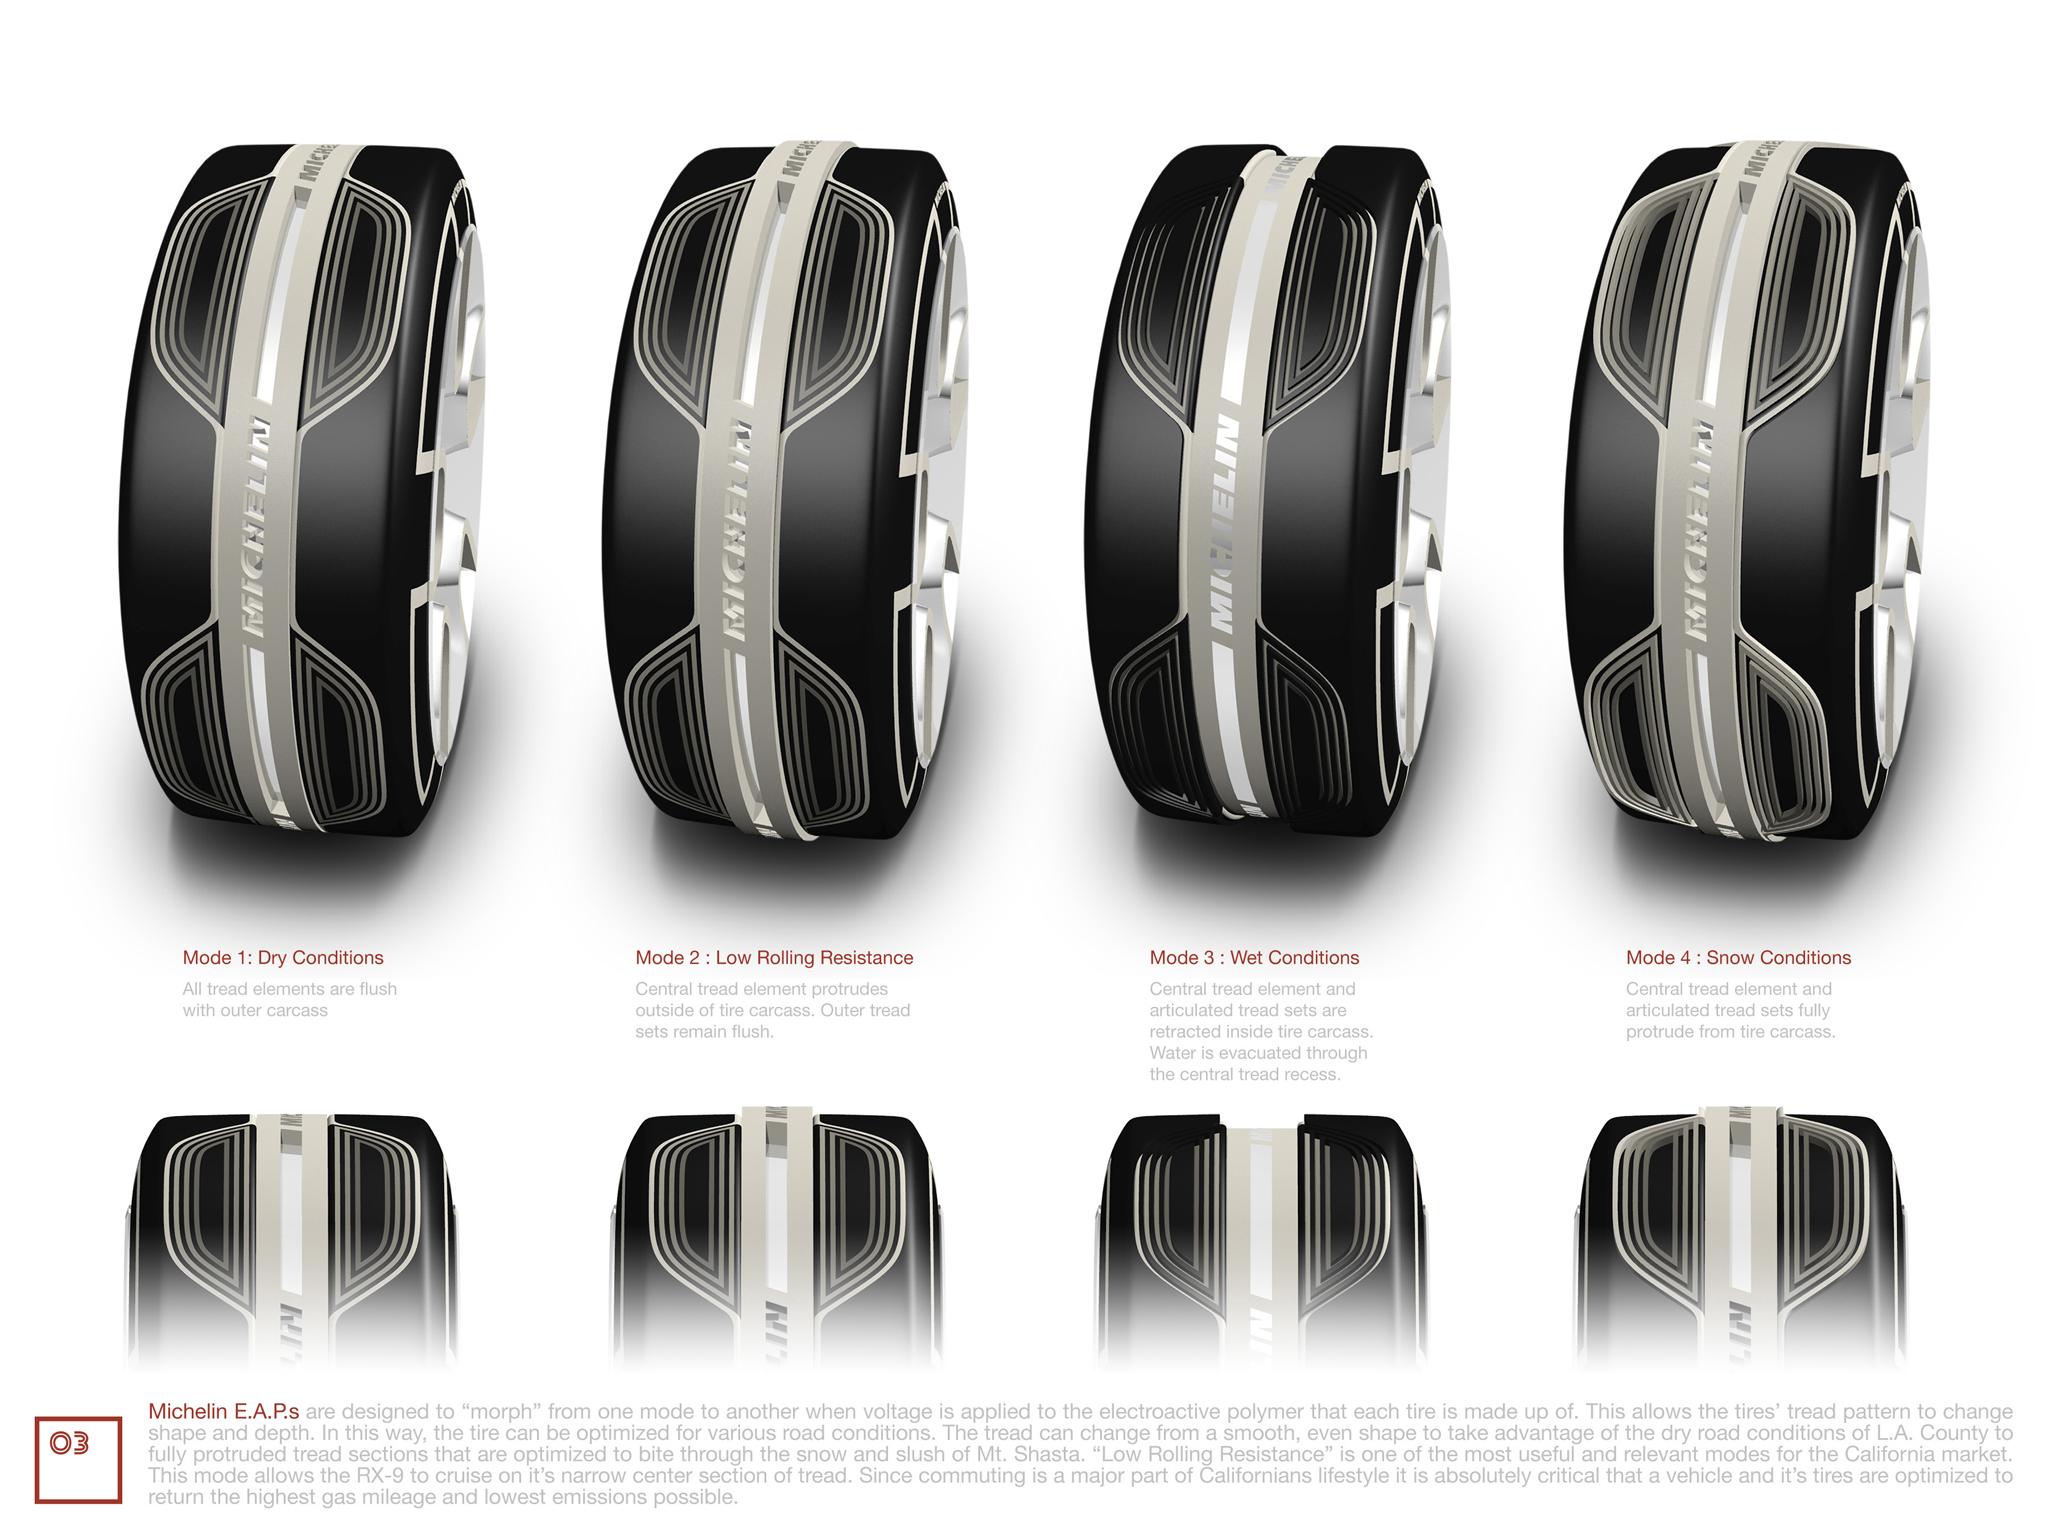 P Design: Michelin E.A.P. Tire System By James Owen, USA